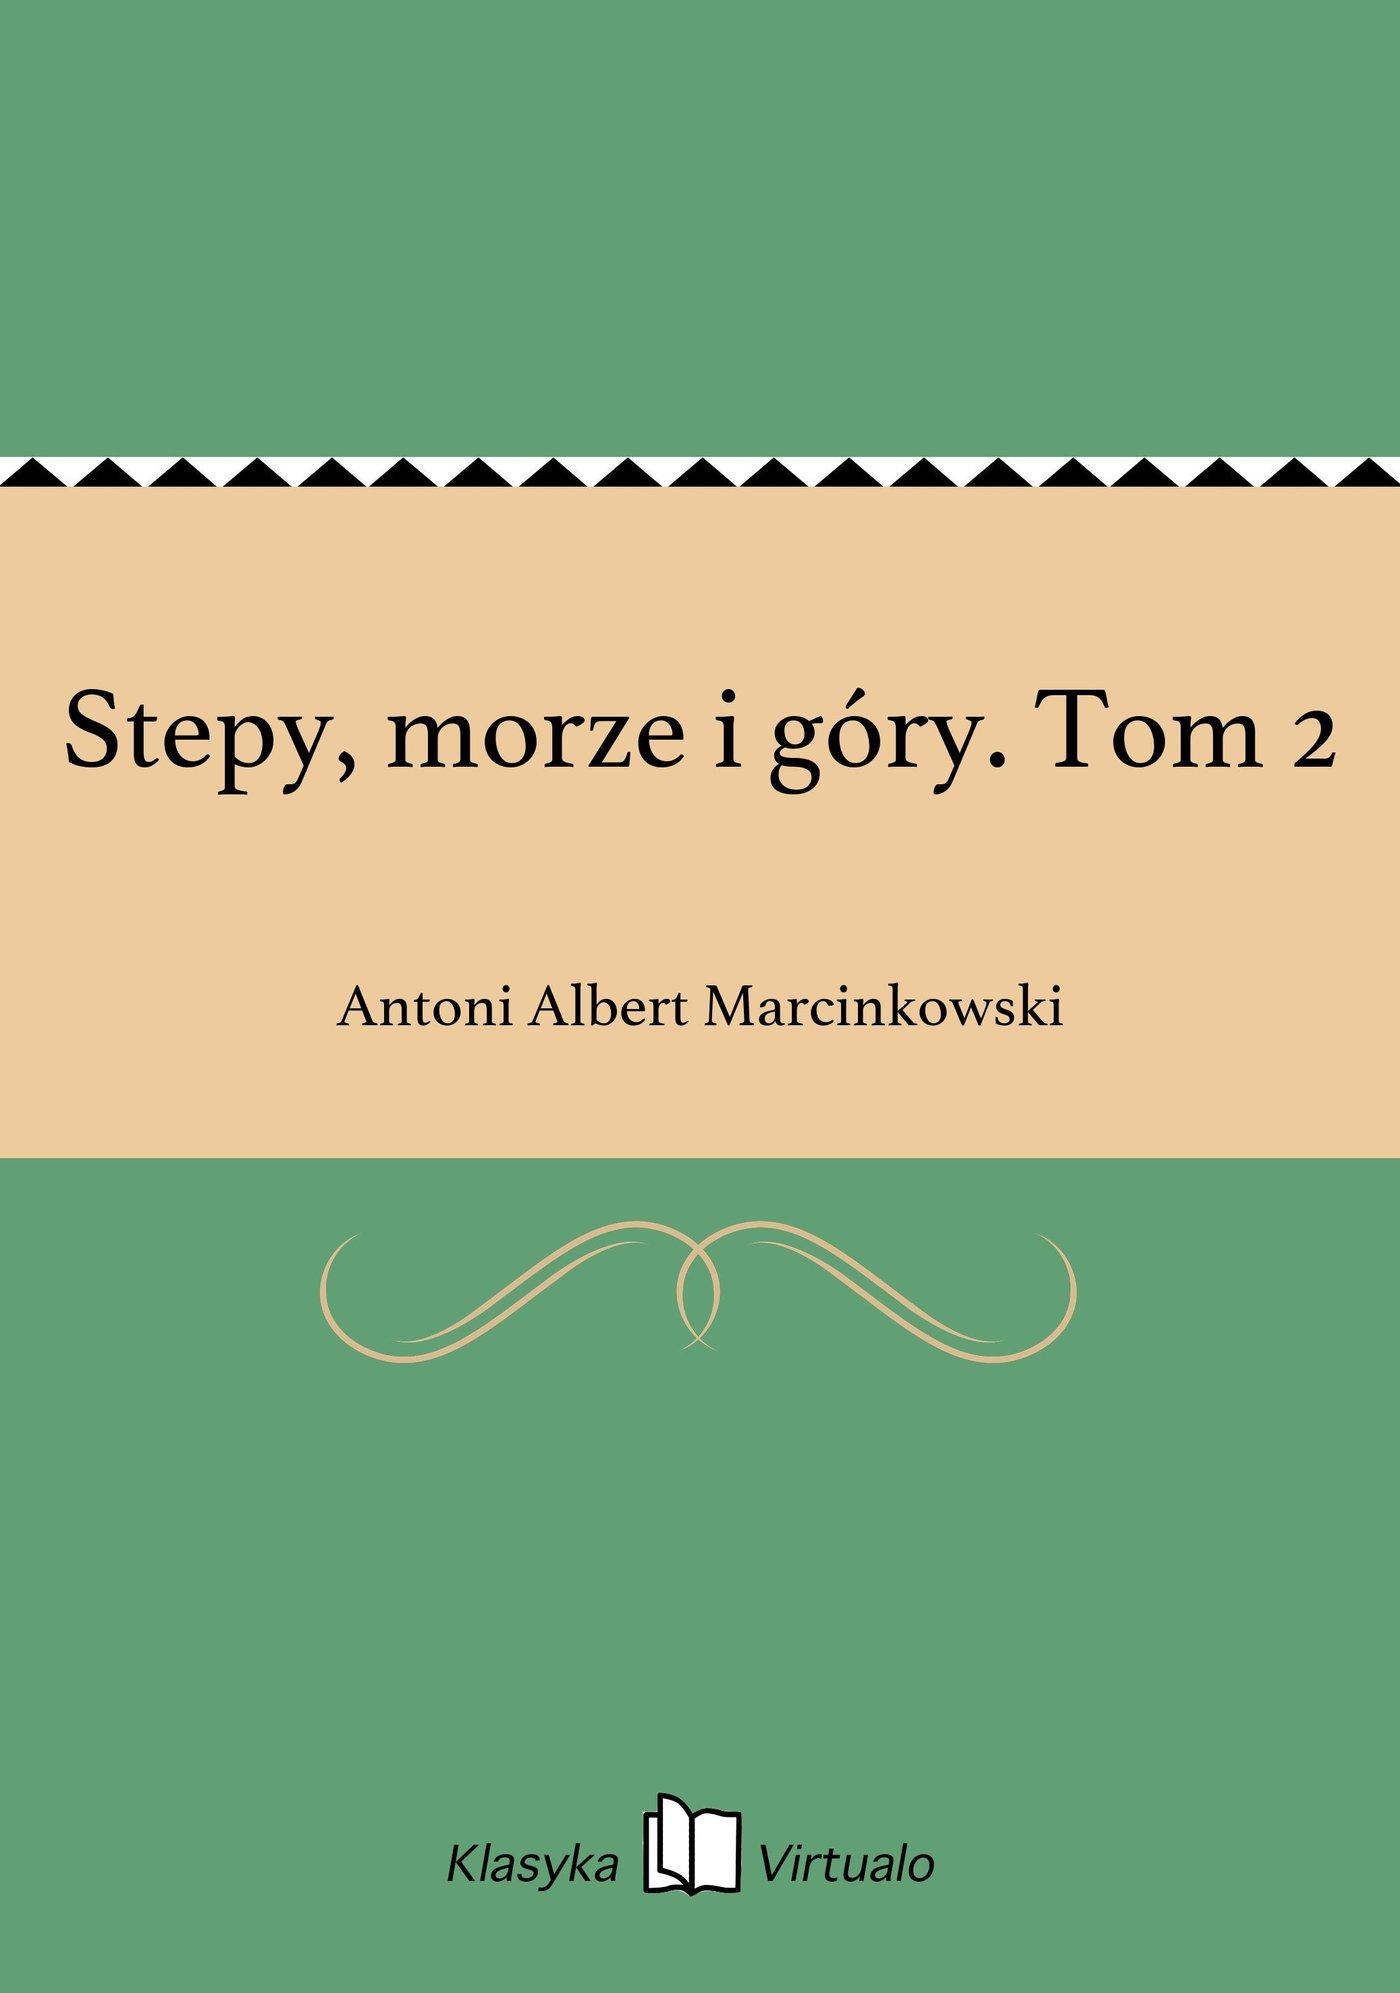 Stepy, morze i góry. Tom 2 - Ebook (Książka na Kindle) do pobrania w formacie MOBI